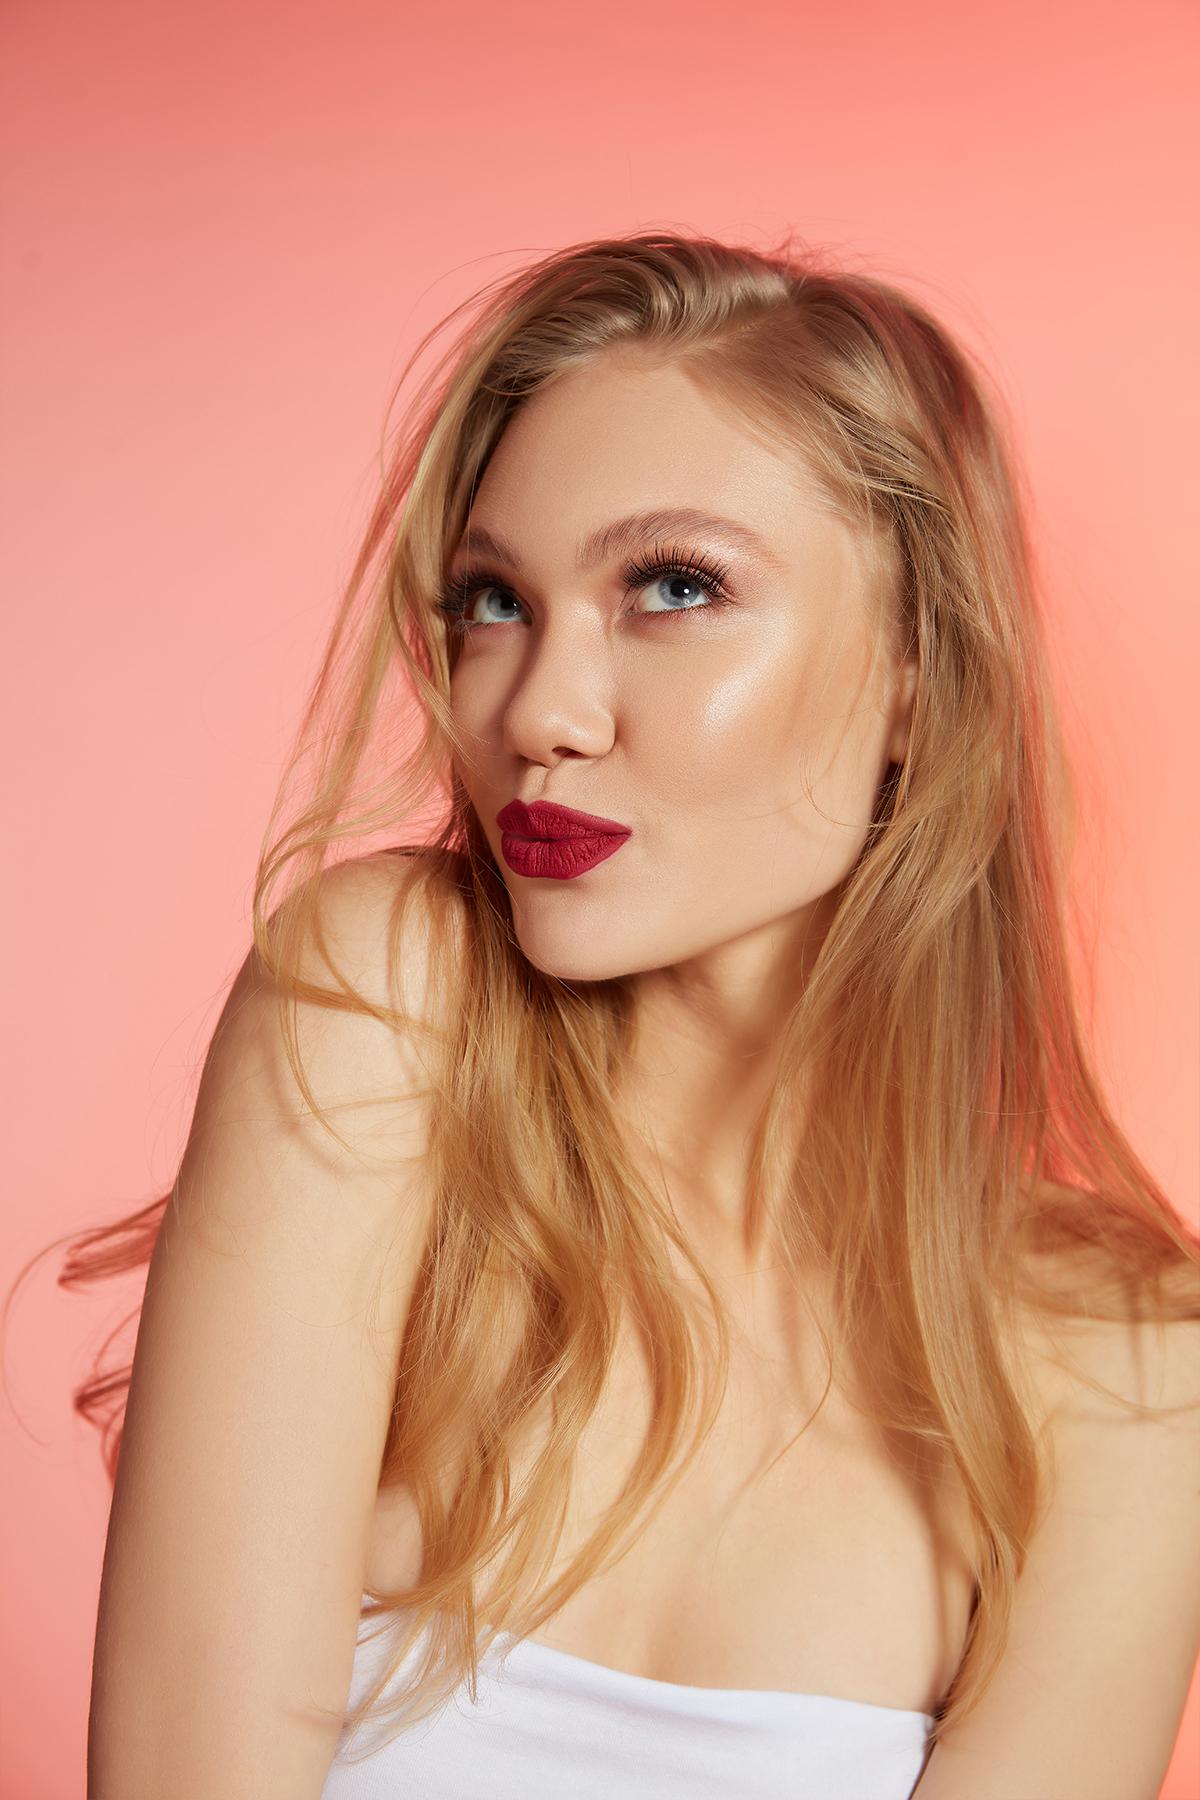 Makeover Handmade 2'li Liquid Lipstick - Paradise - 4ml -Ruj - Lipstick Thumbnail